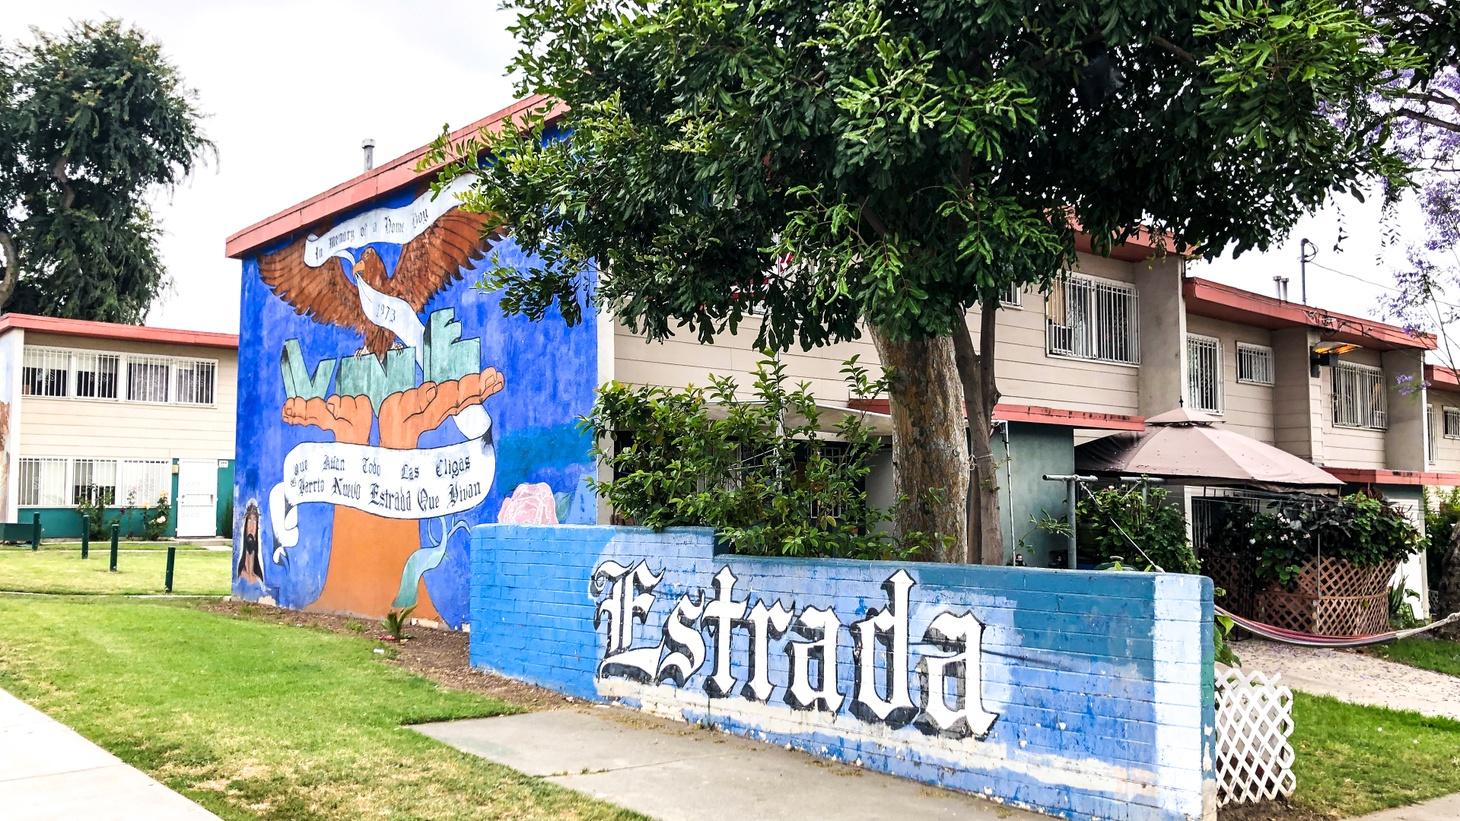 A mural at Estrada Courts in East LA.